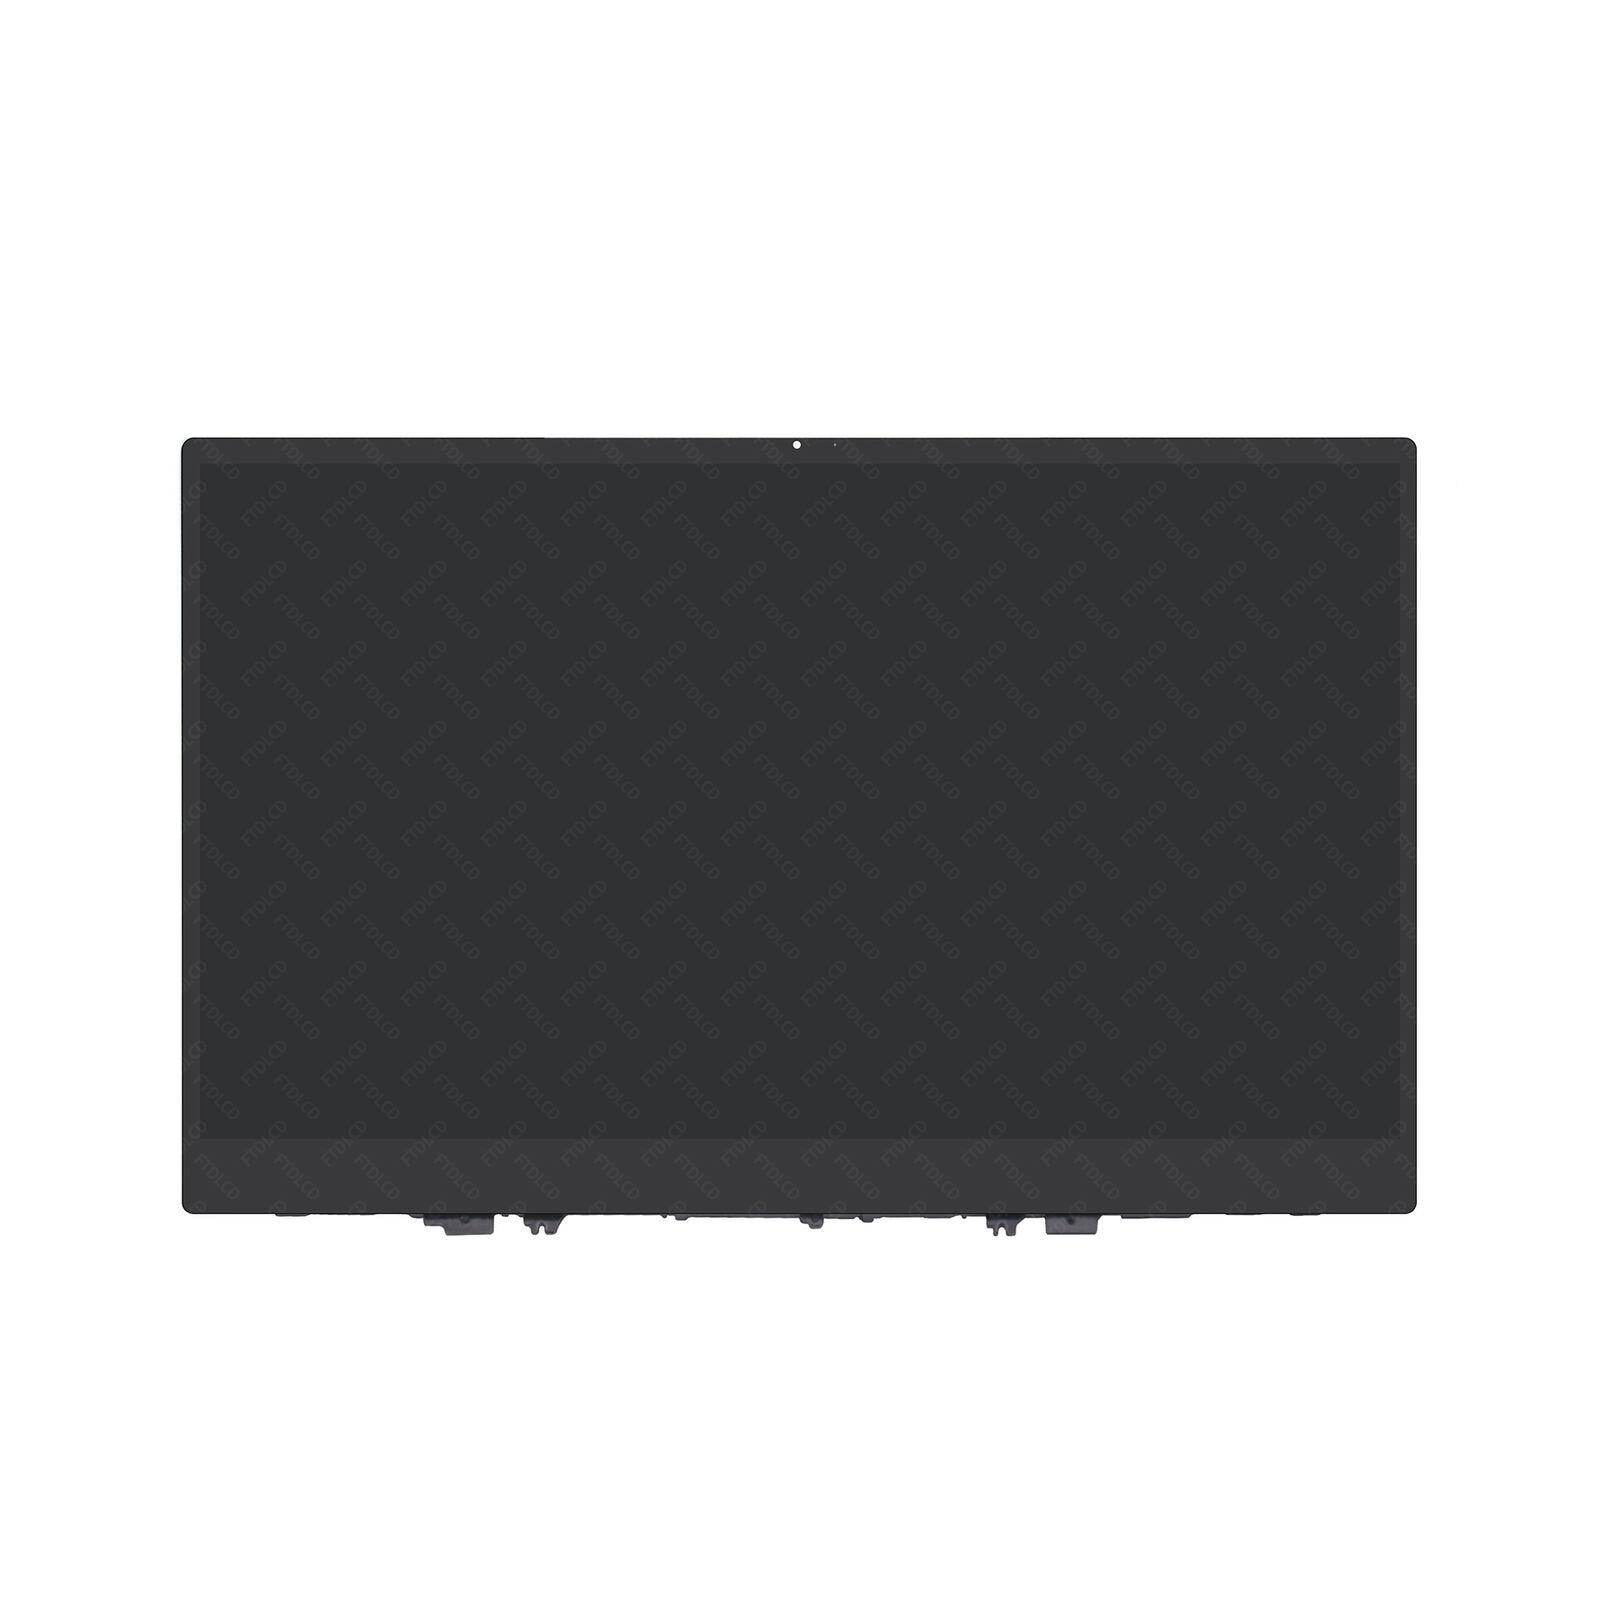 Yanlun-مجموعة شاشة LCD تعمل باللمس ، FHD IPS LED ، زجاج لجهاز Lenovo ideapad 530S-15IKB